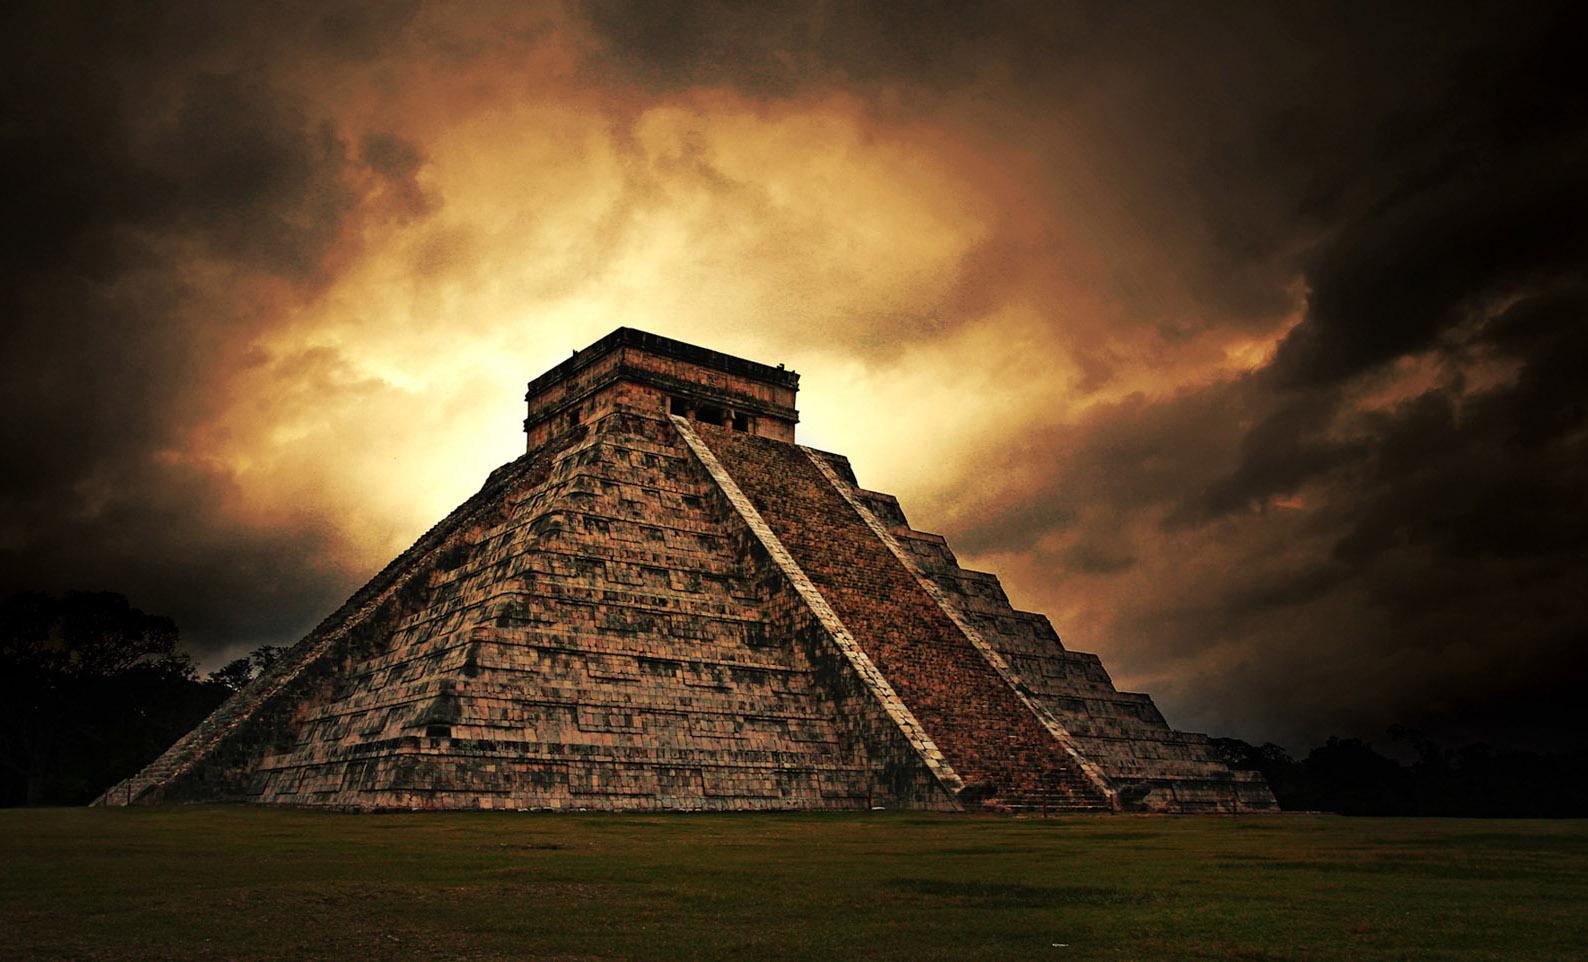 Chichén Itzá – beautiful religious site